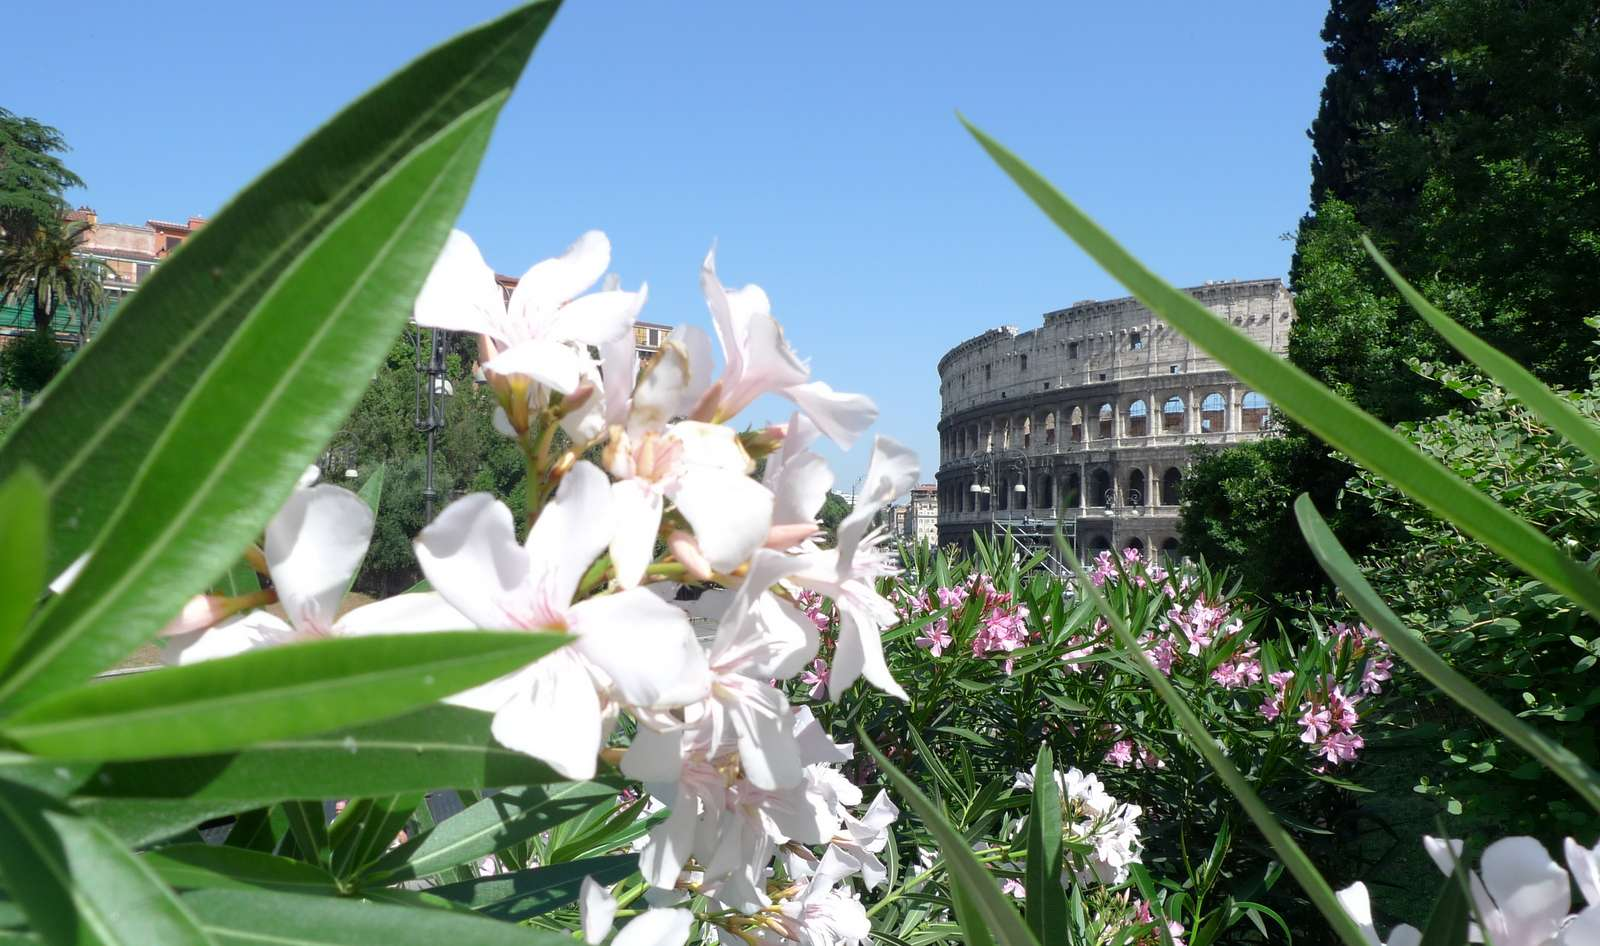 Et glimt af Colosseum